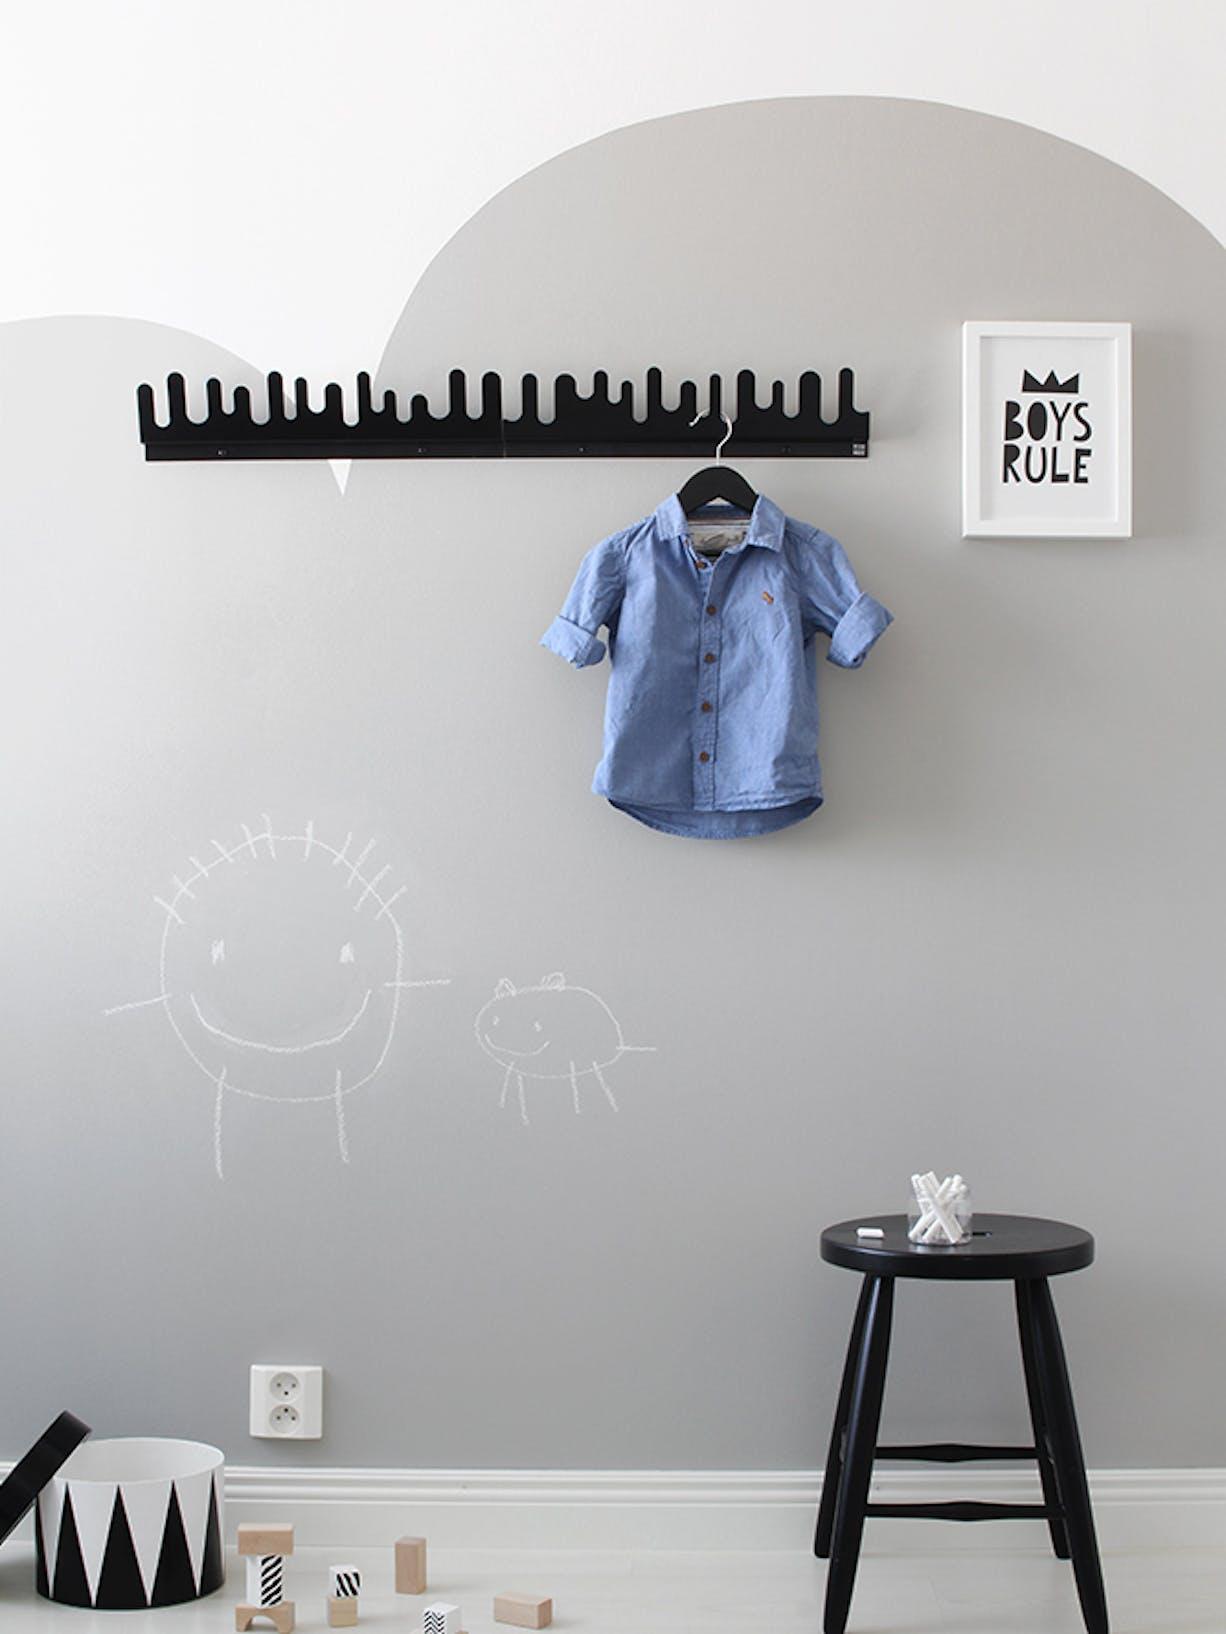 DIY Chalkboard Wall For Your Kids Bedroom or Nursery left Image